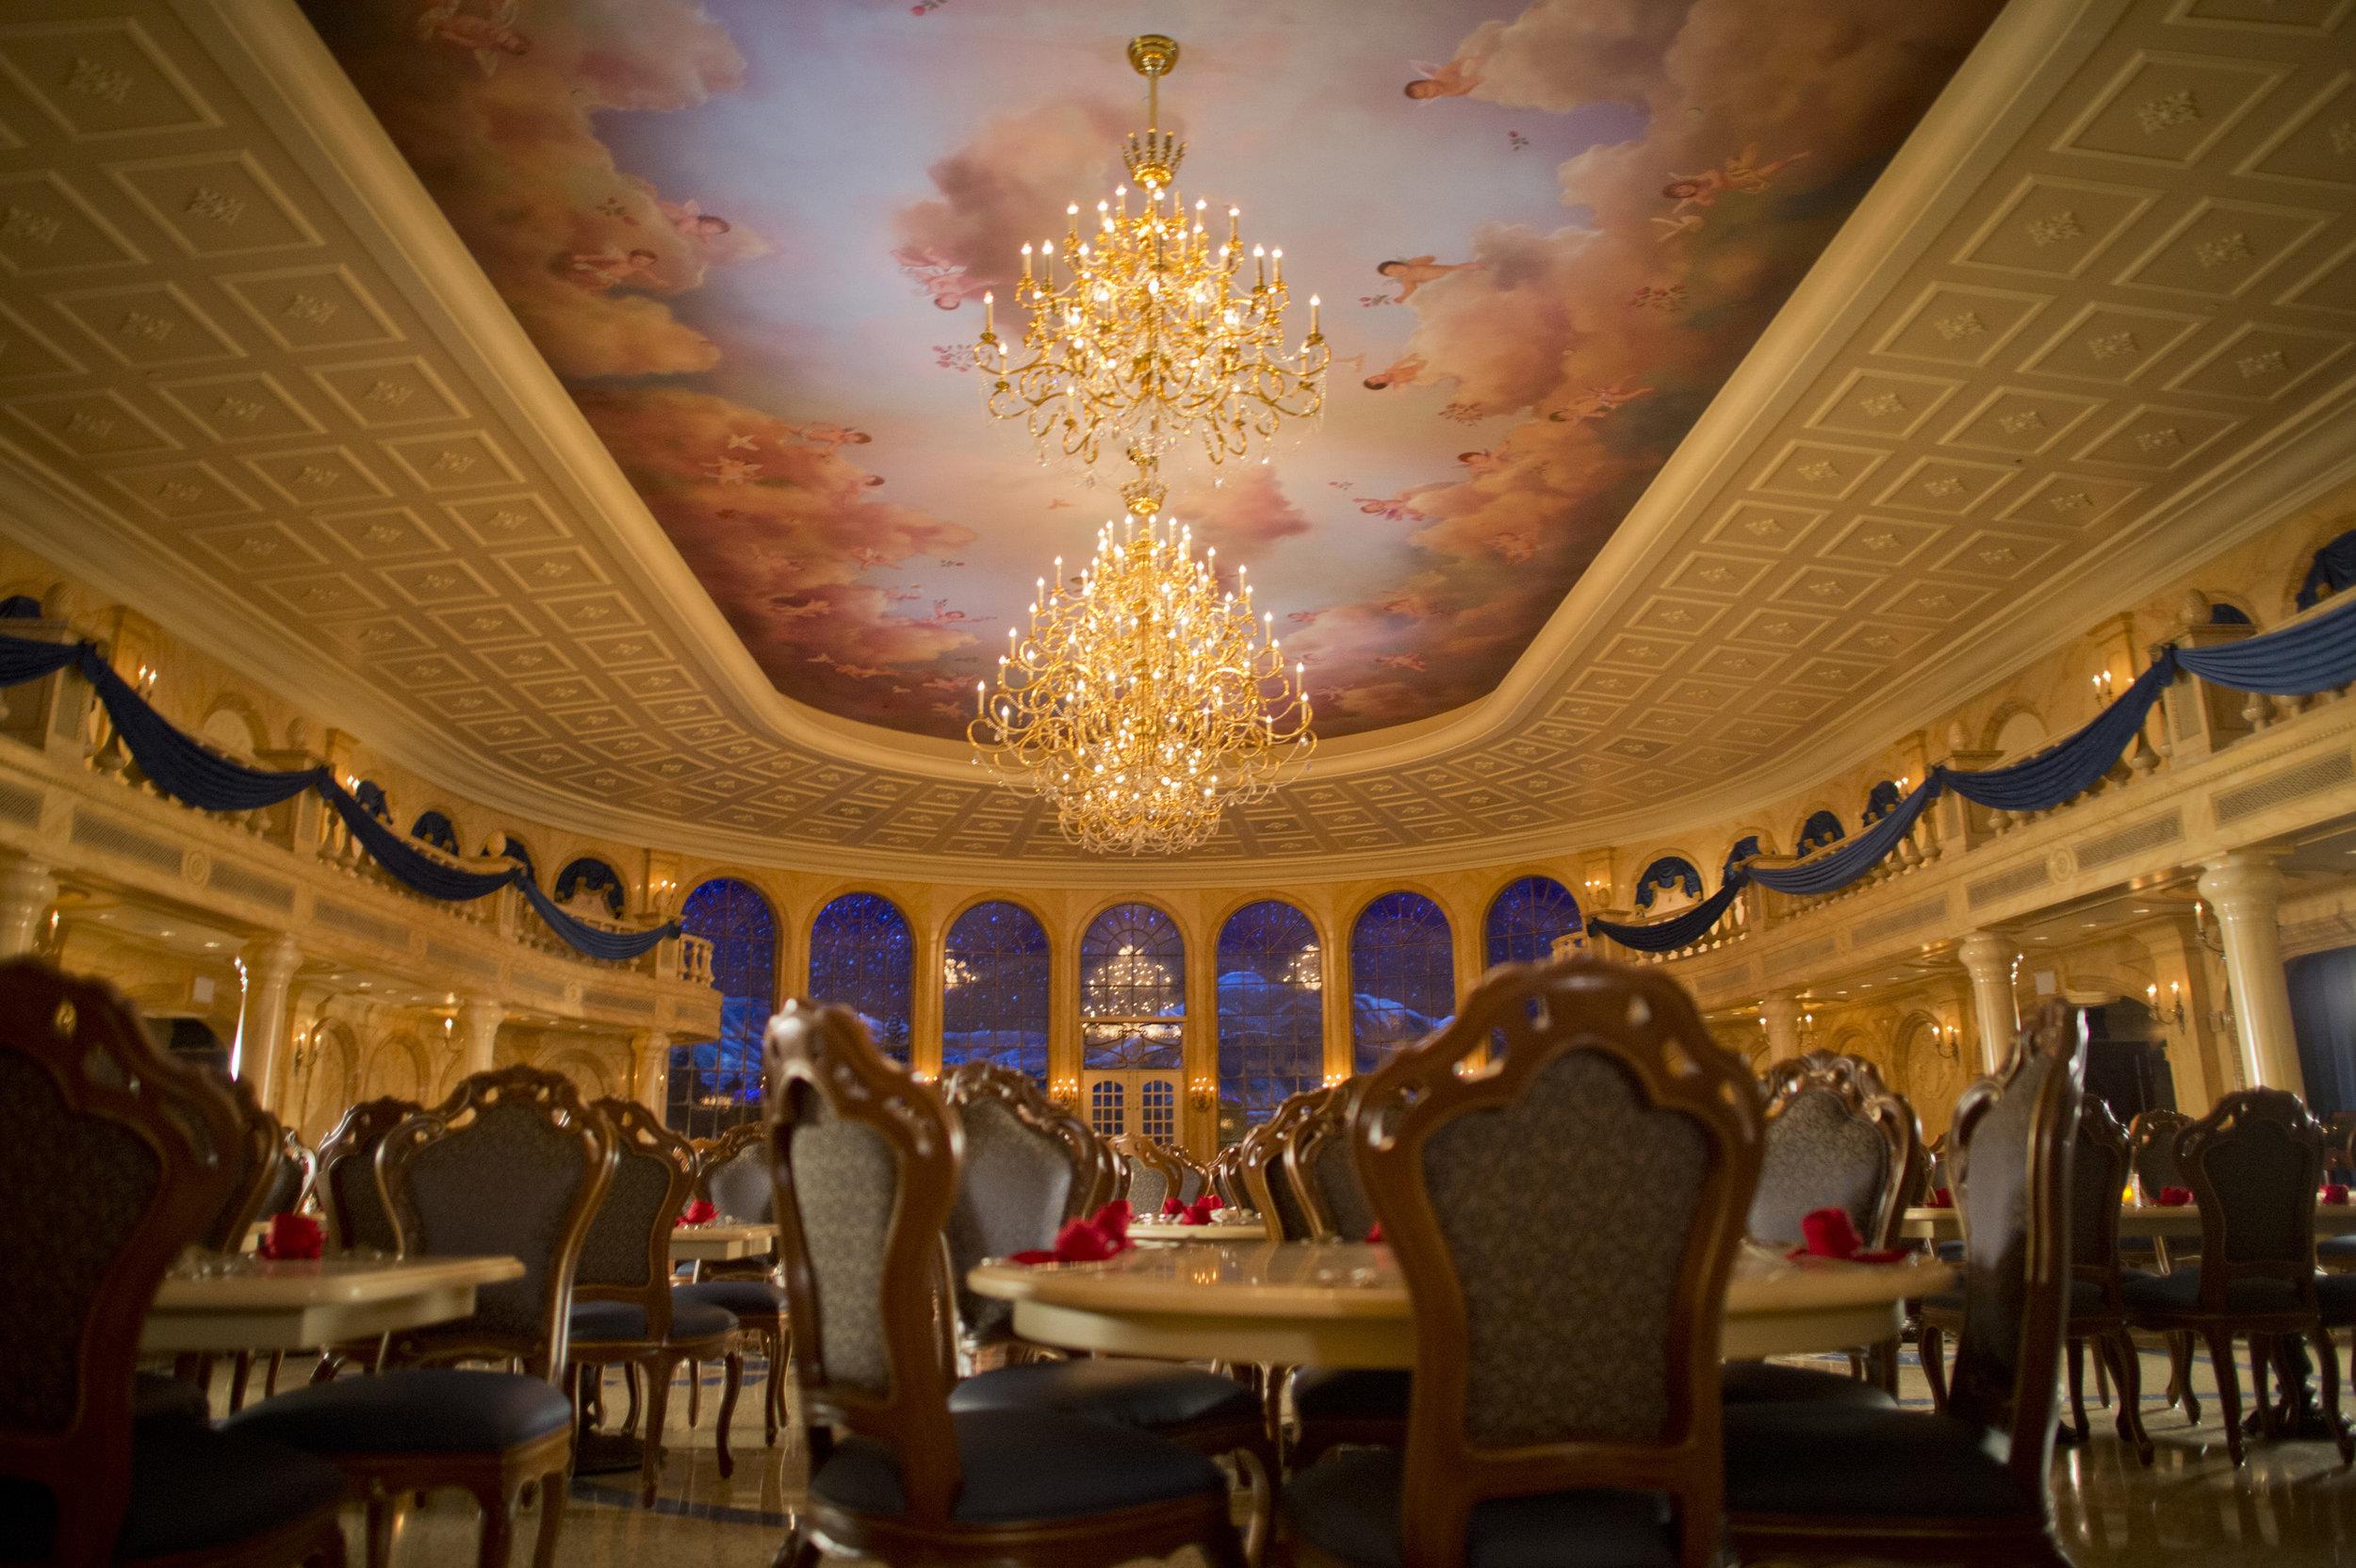 Best Disney Restaurants - Be Our Guest Restaurant